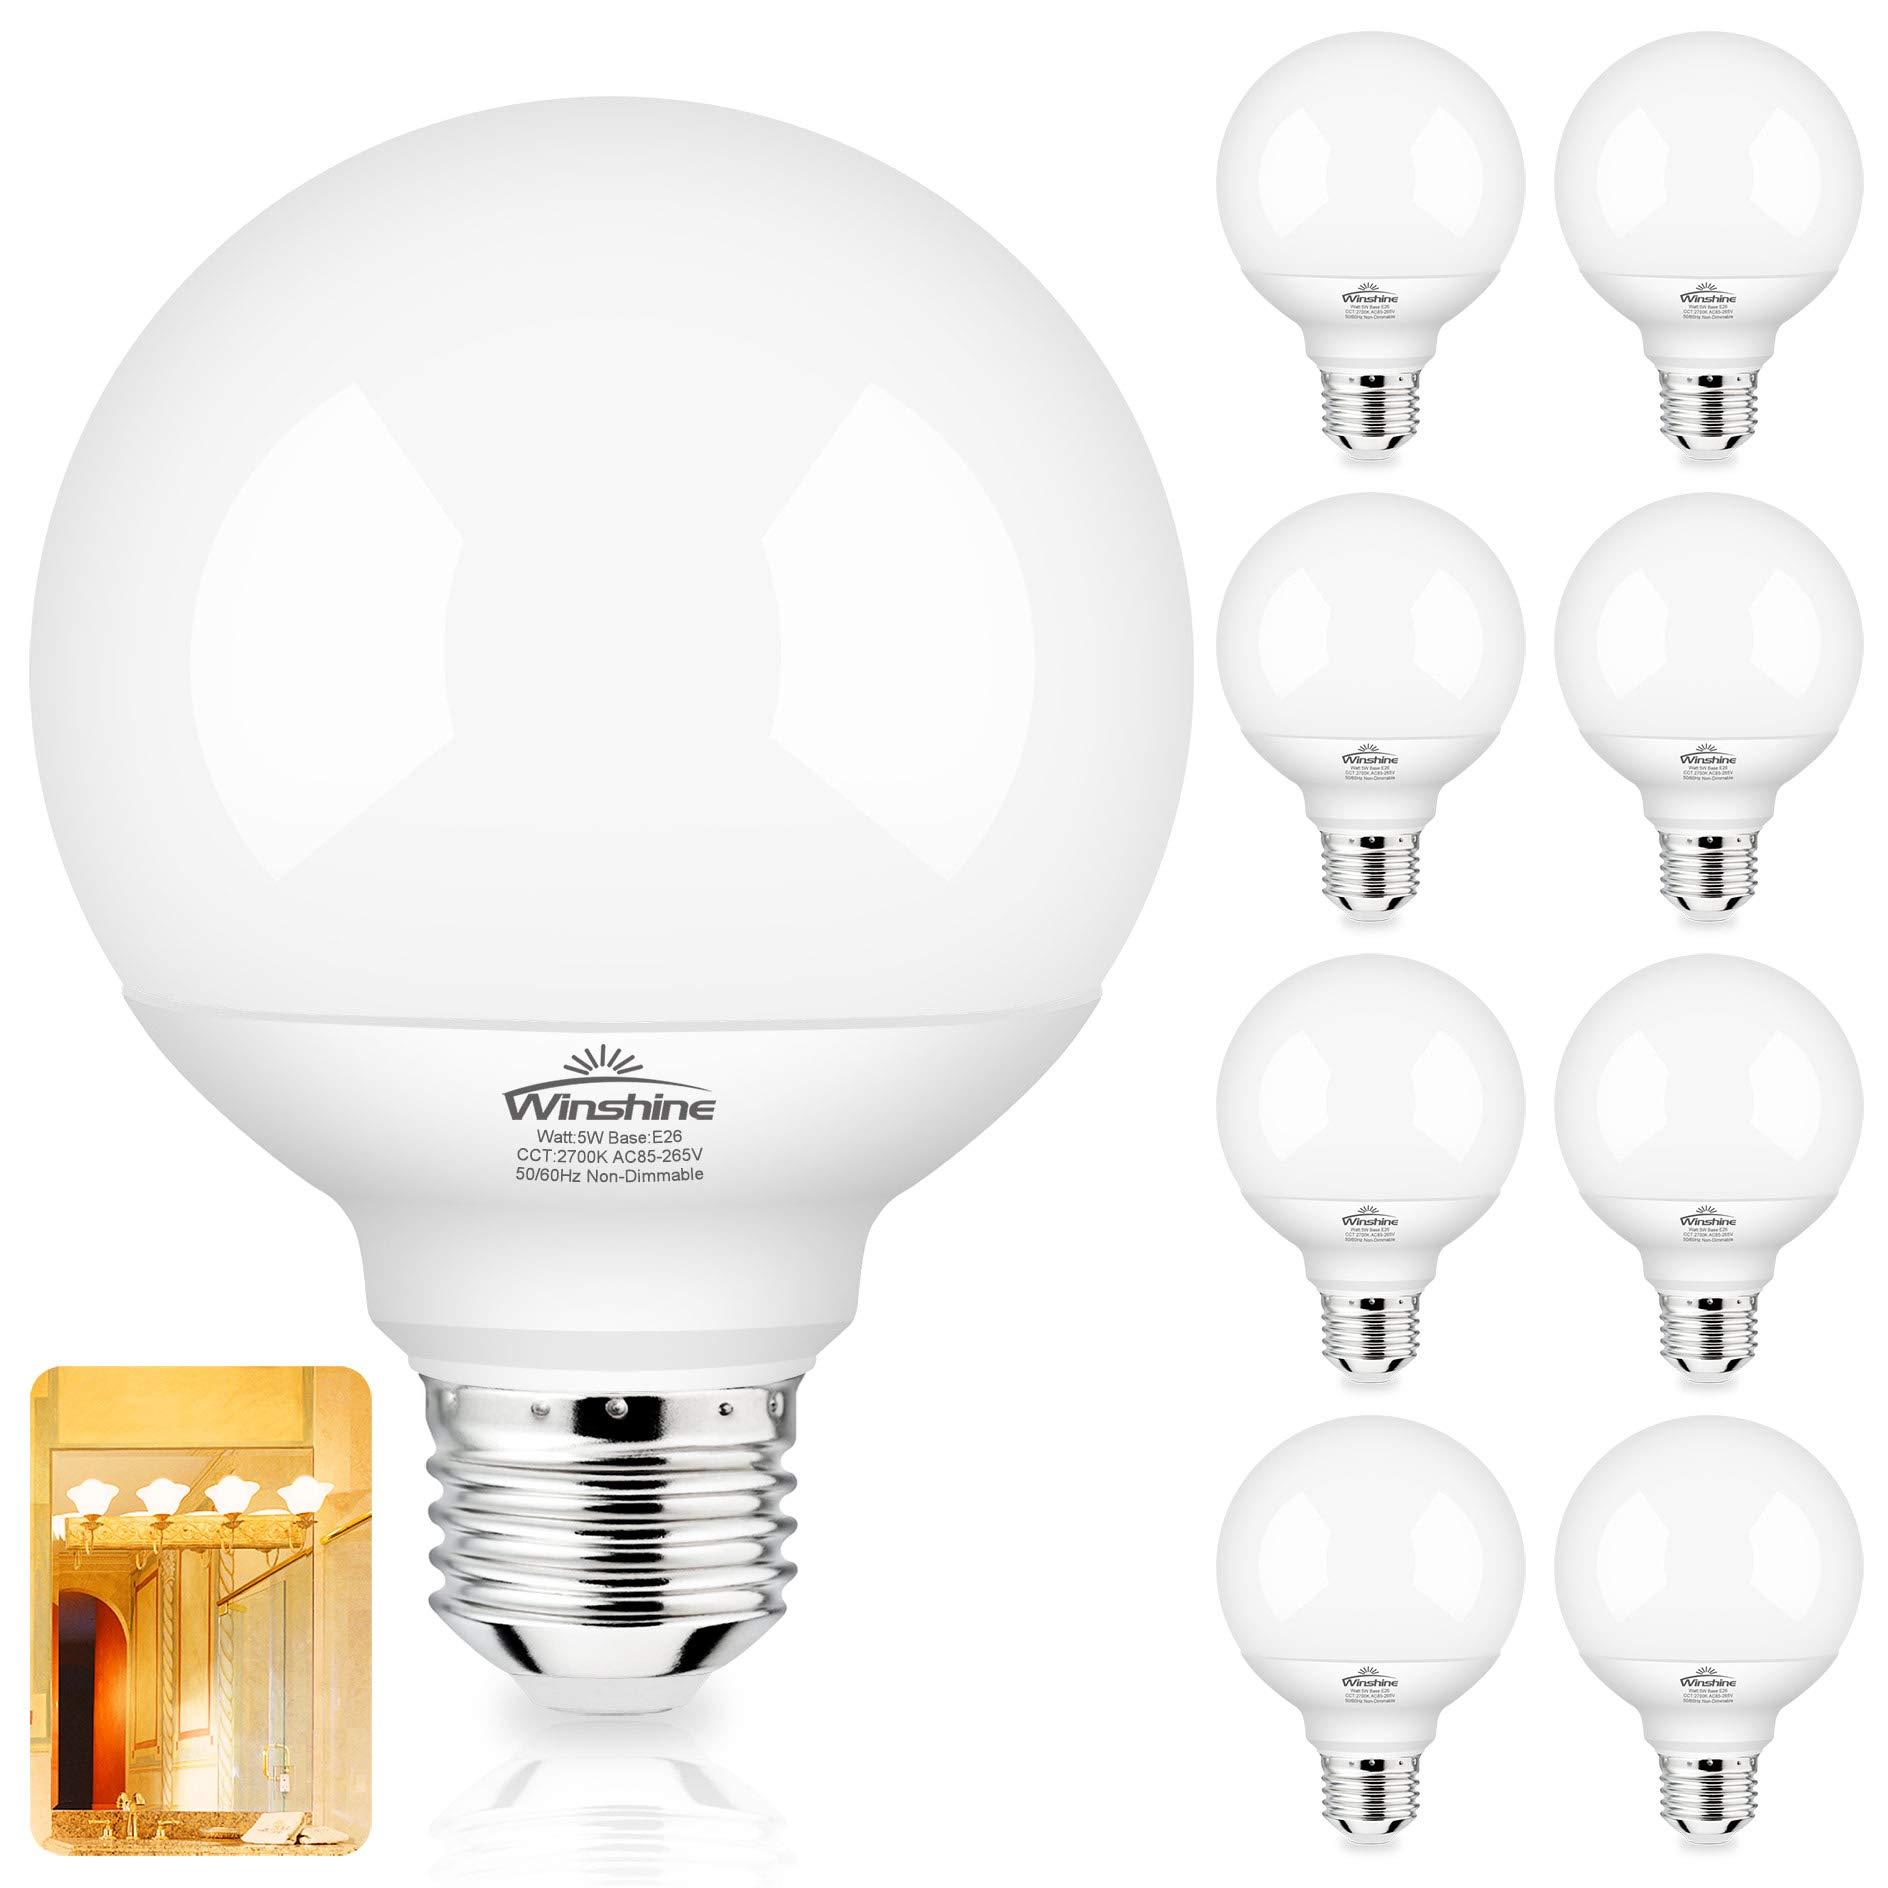 G25 LED Bulb Globe Shape E26 Medium Screw Base, 5W 60W Equivalent 8 Pack LED Vanity Light 2700K Warm White Idear for Bathroom Vanity Makeup Mirror, Winshine Bedroom Lights ,500LM, Non-dimmable